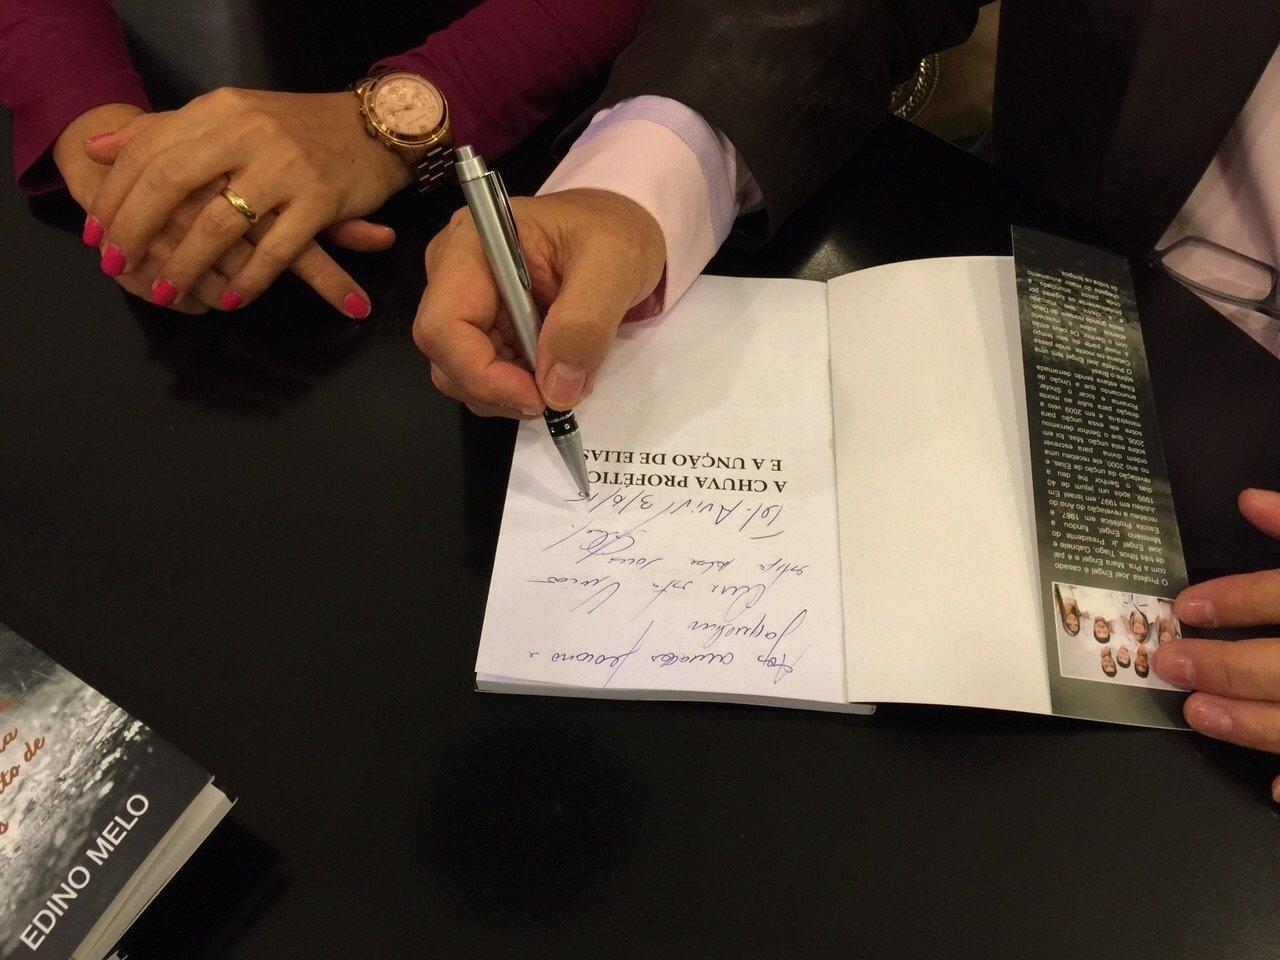 Ap. Joel Engel promove lançamento de seu livro em Israel